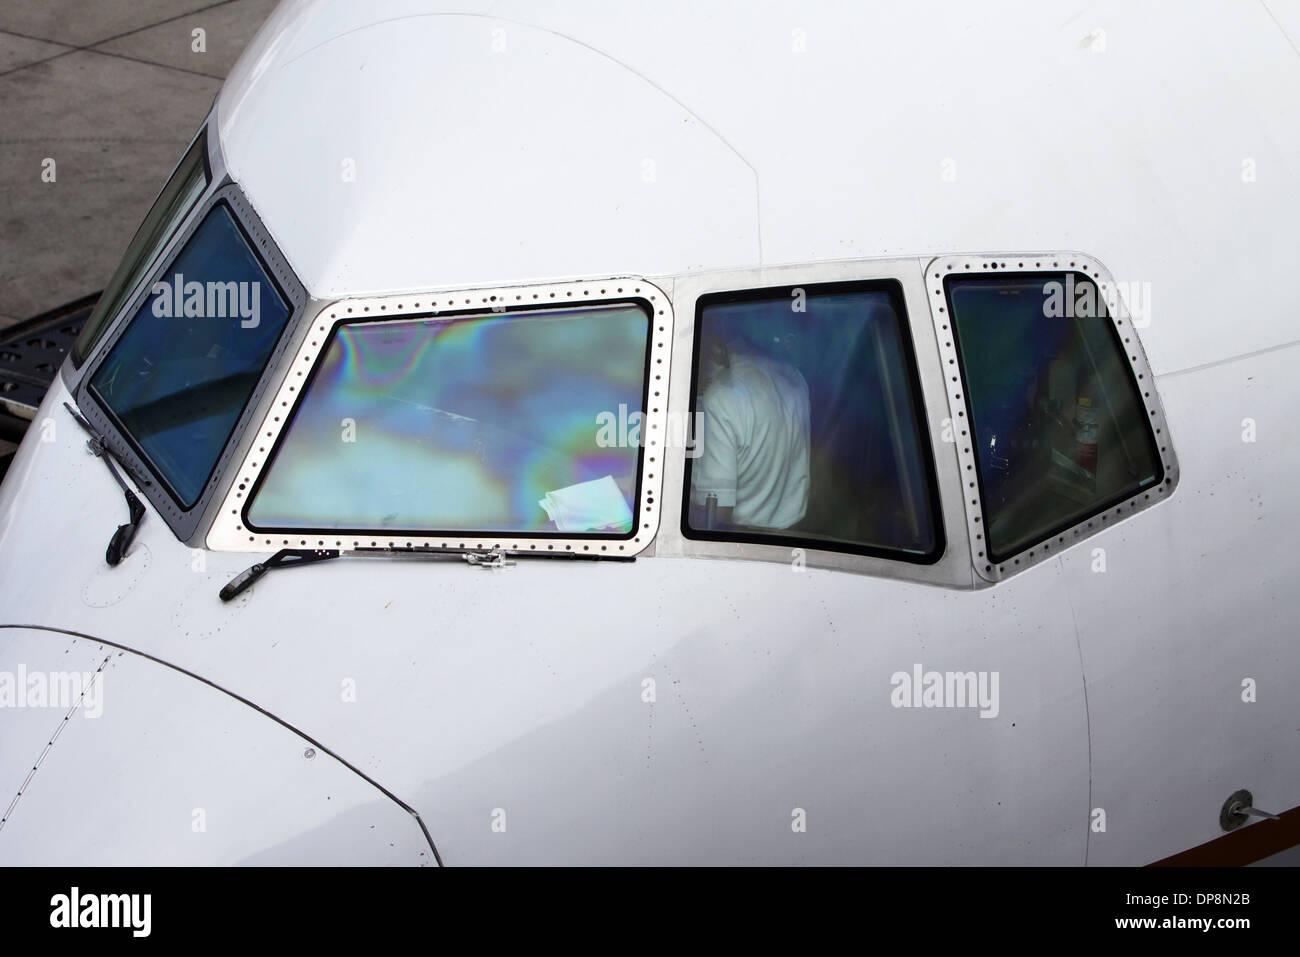 Aircraft Cokpit Windows Stock Photo